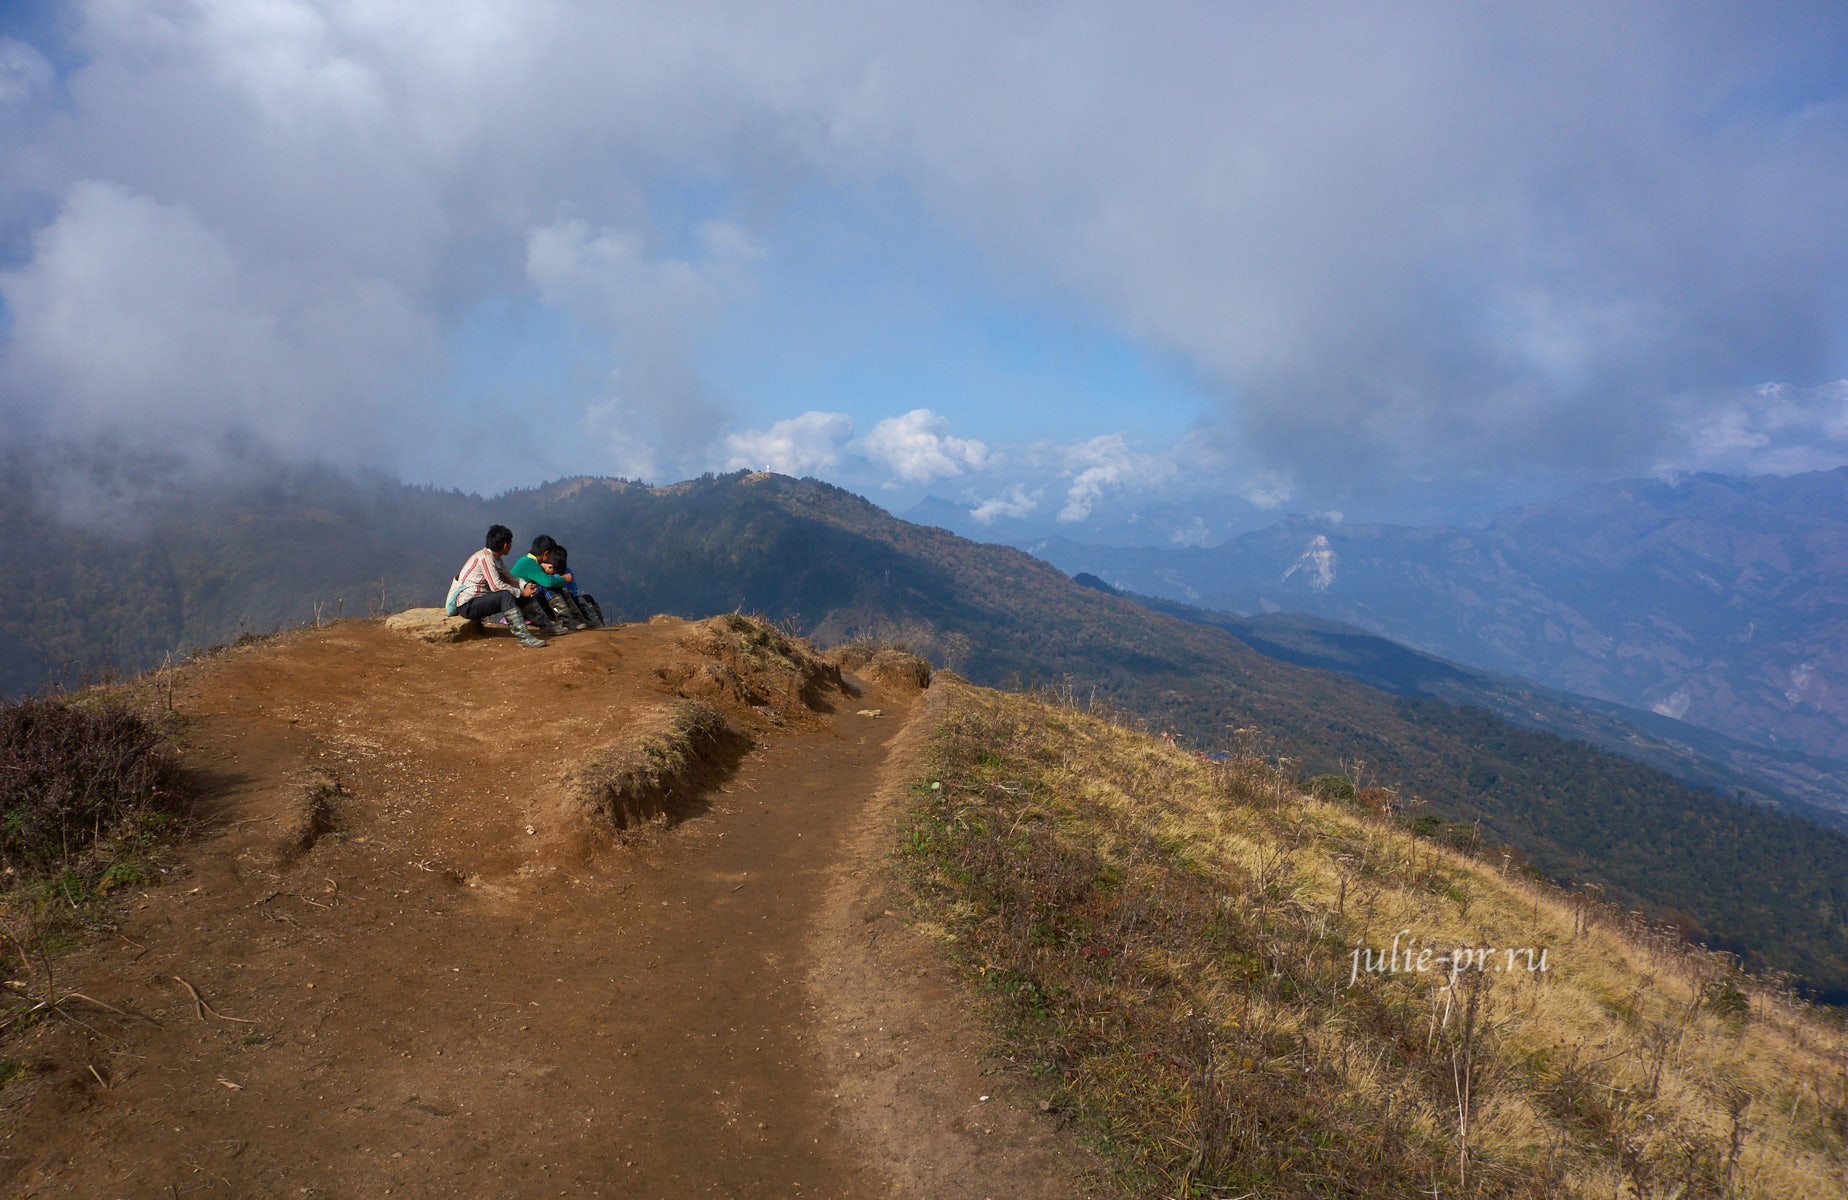 Непал, Пун-Хилл трек, Перевал Деурали